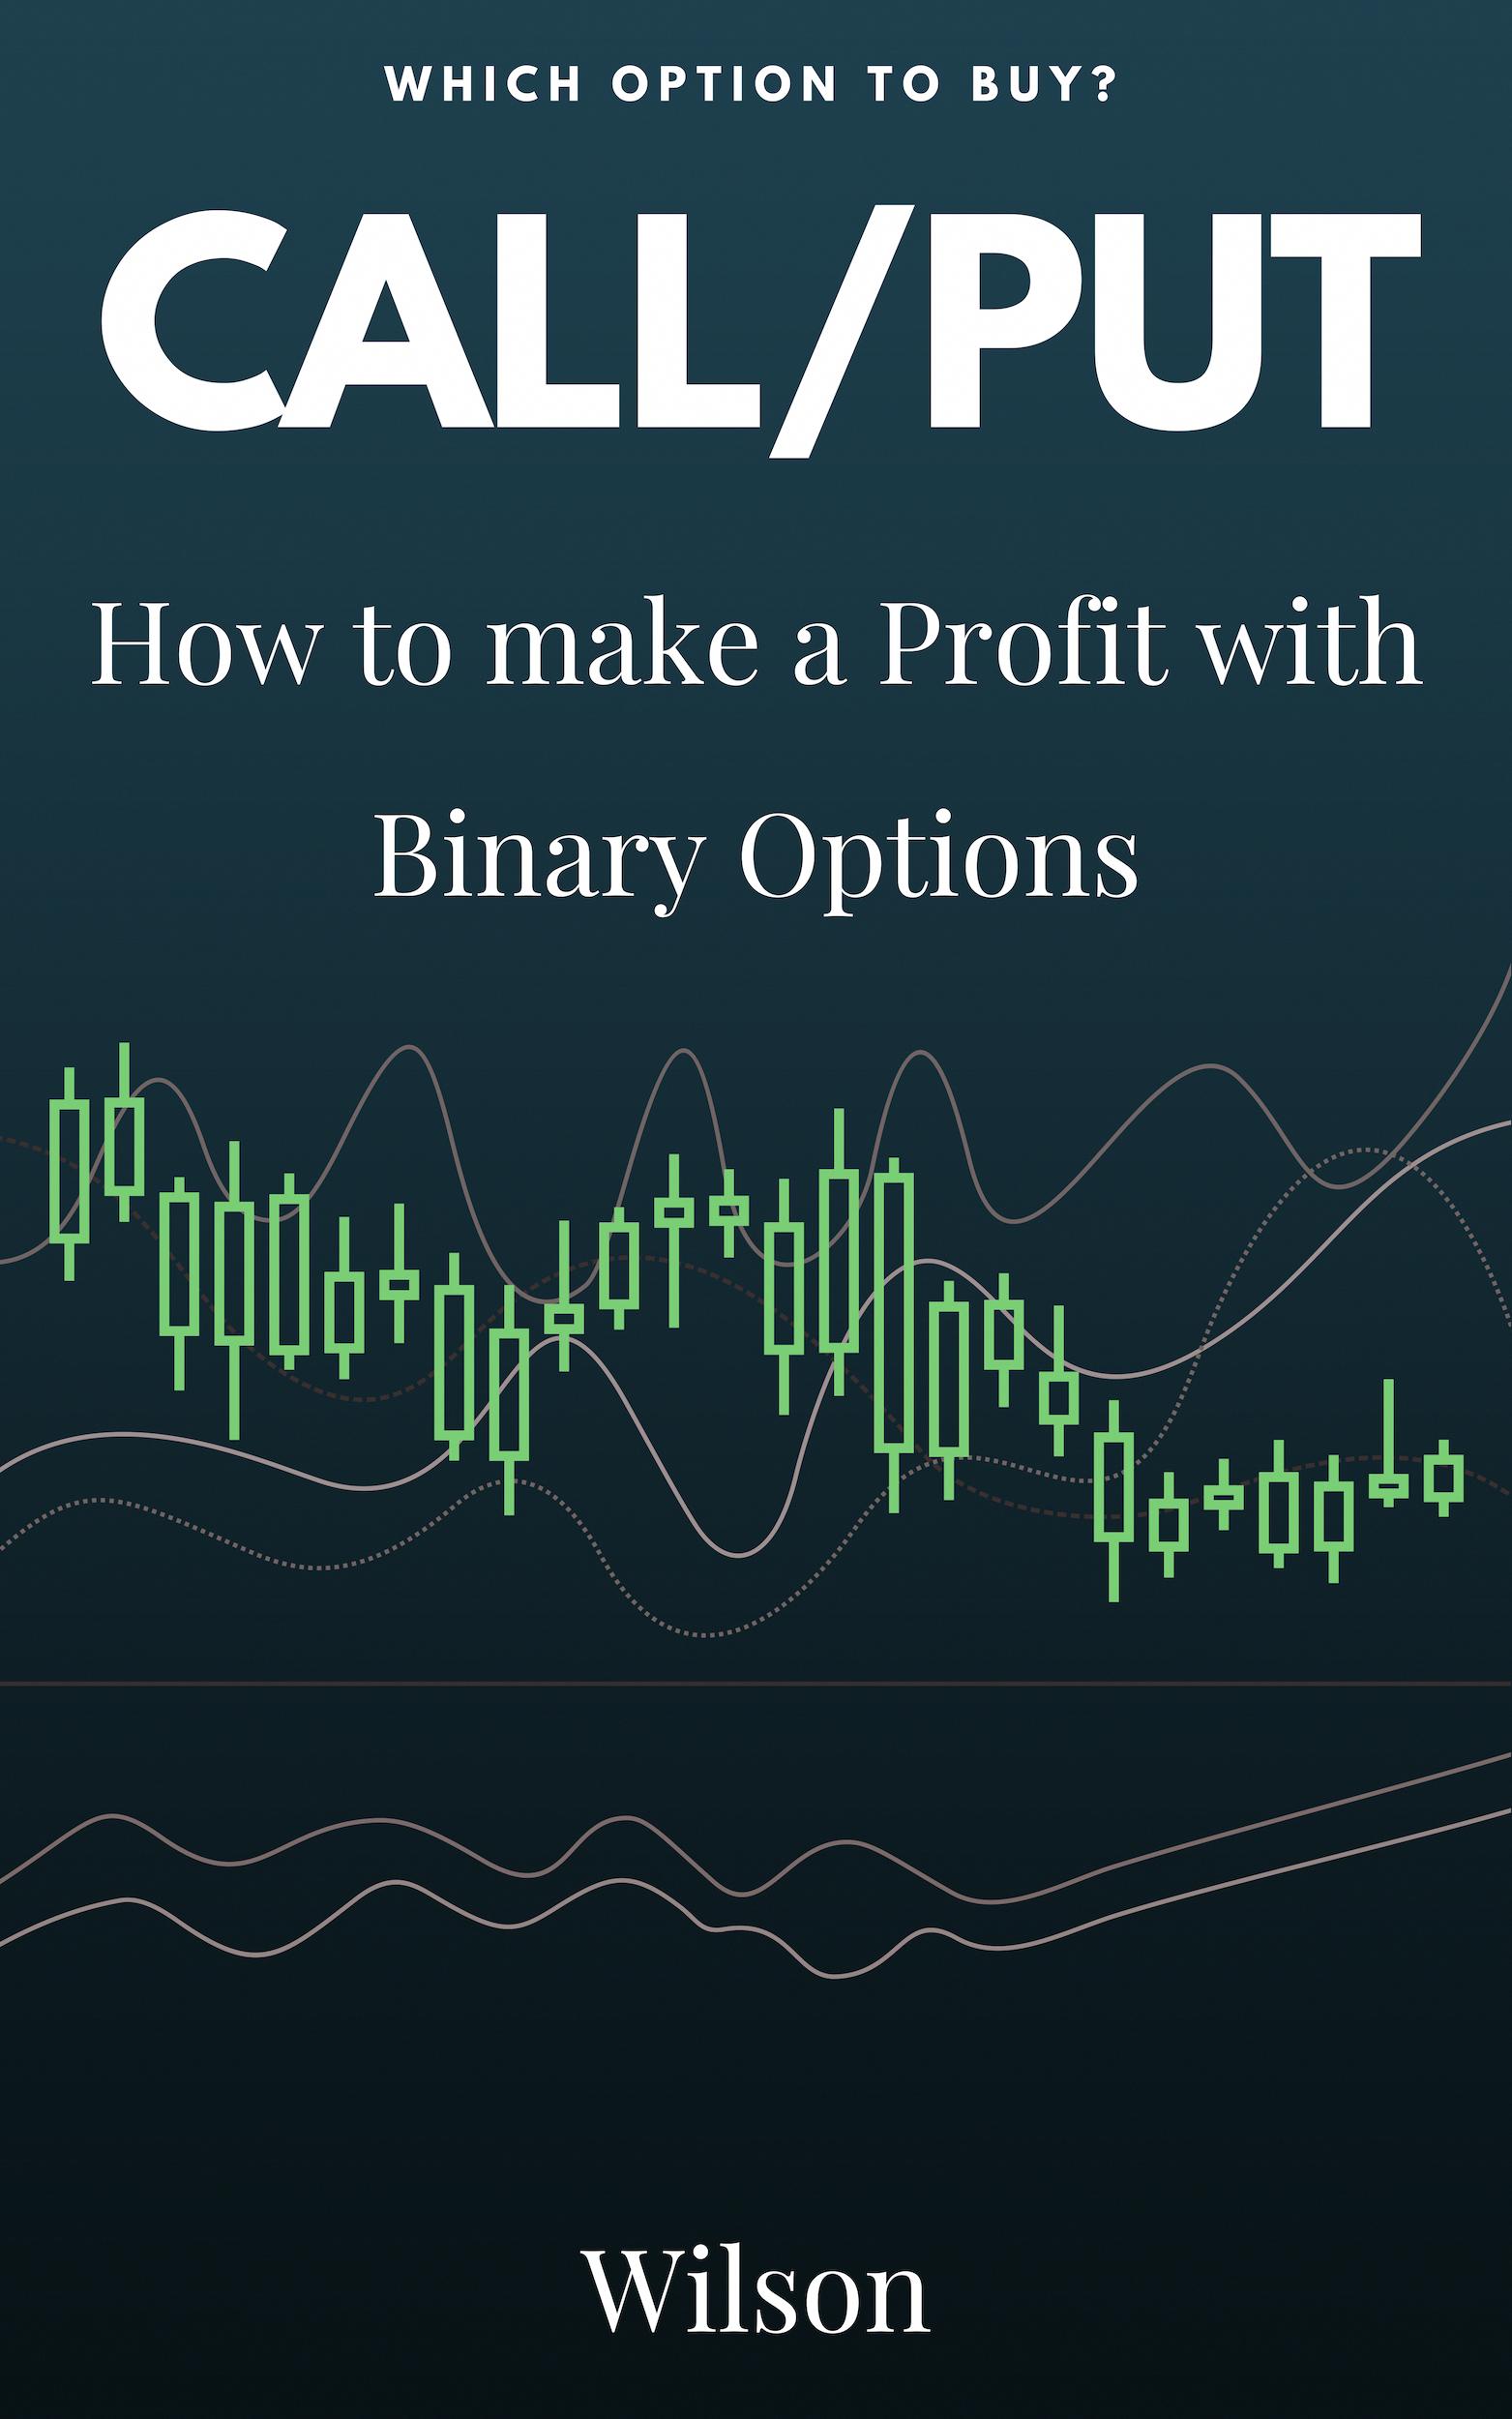 How to trade binary options ebook boylesports mobile betting setup